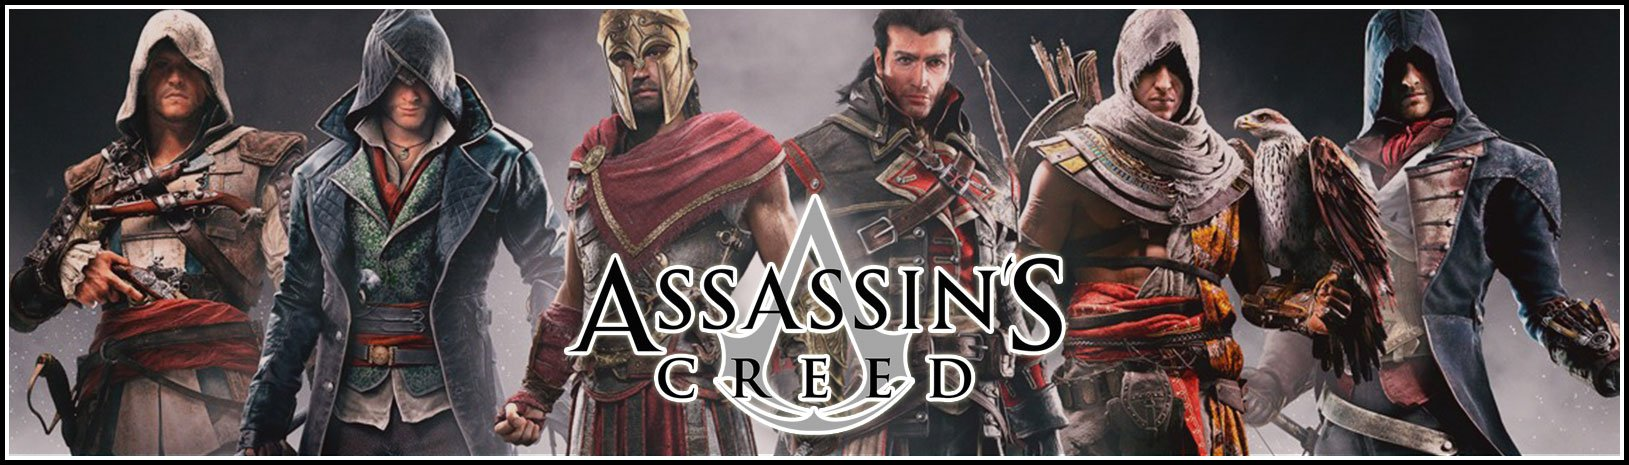 Assassin Creed Merchandise